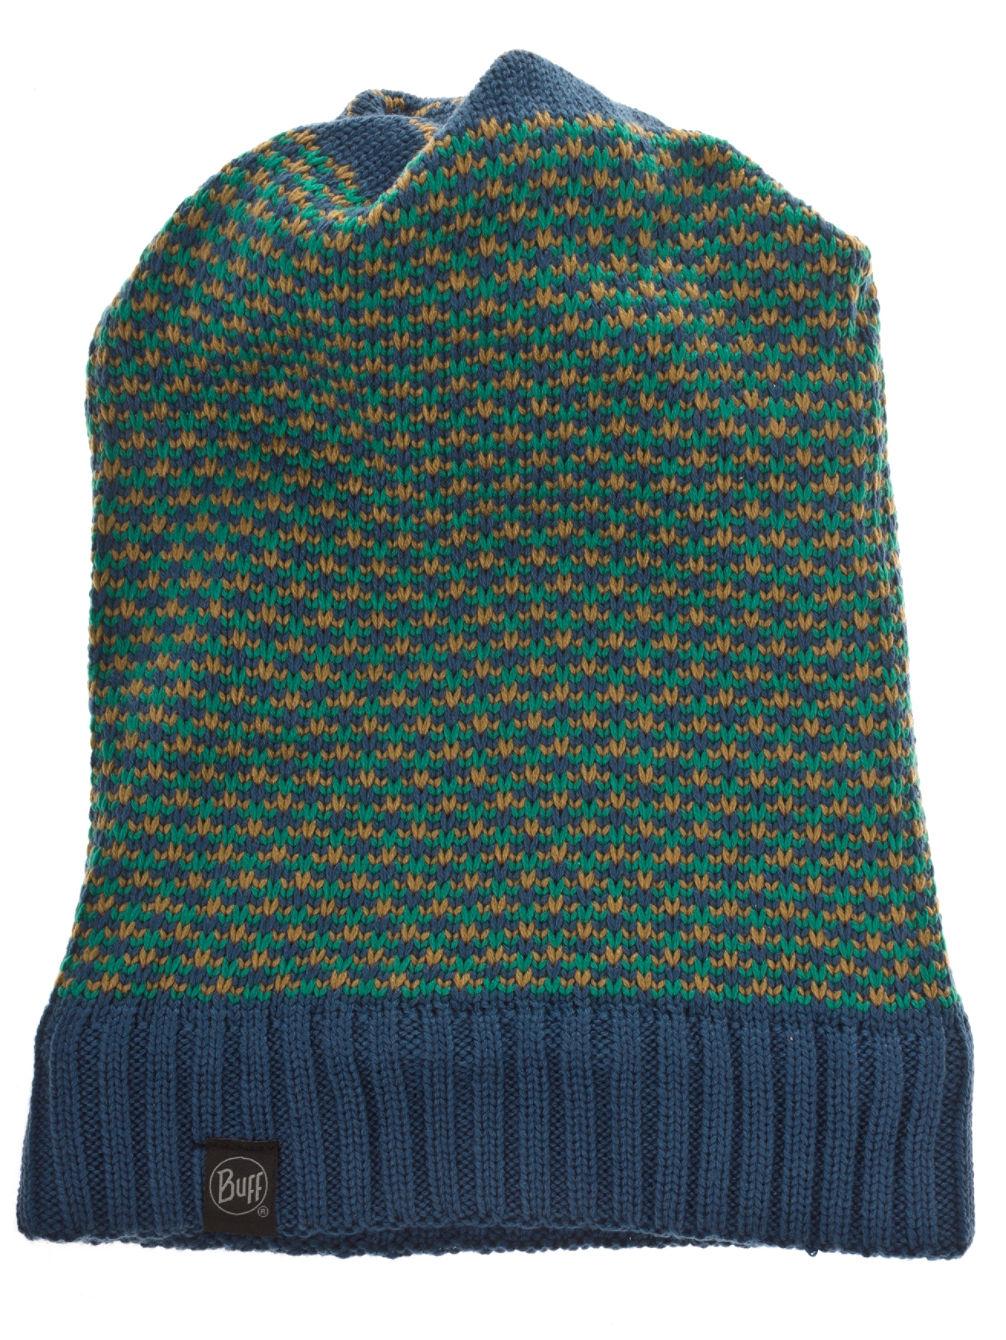 knitted-neckwarmer-buff-beanie